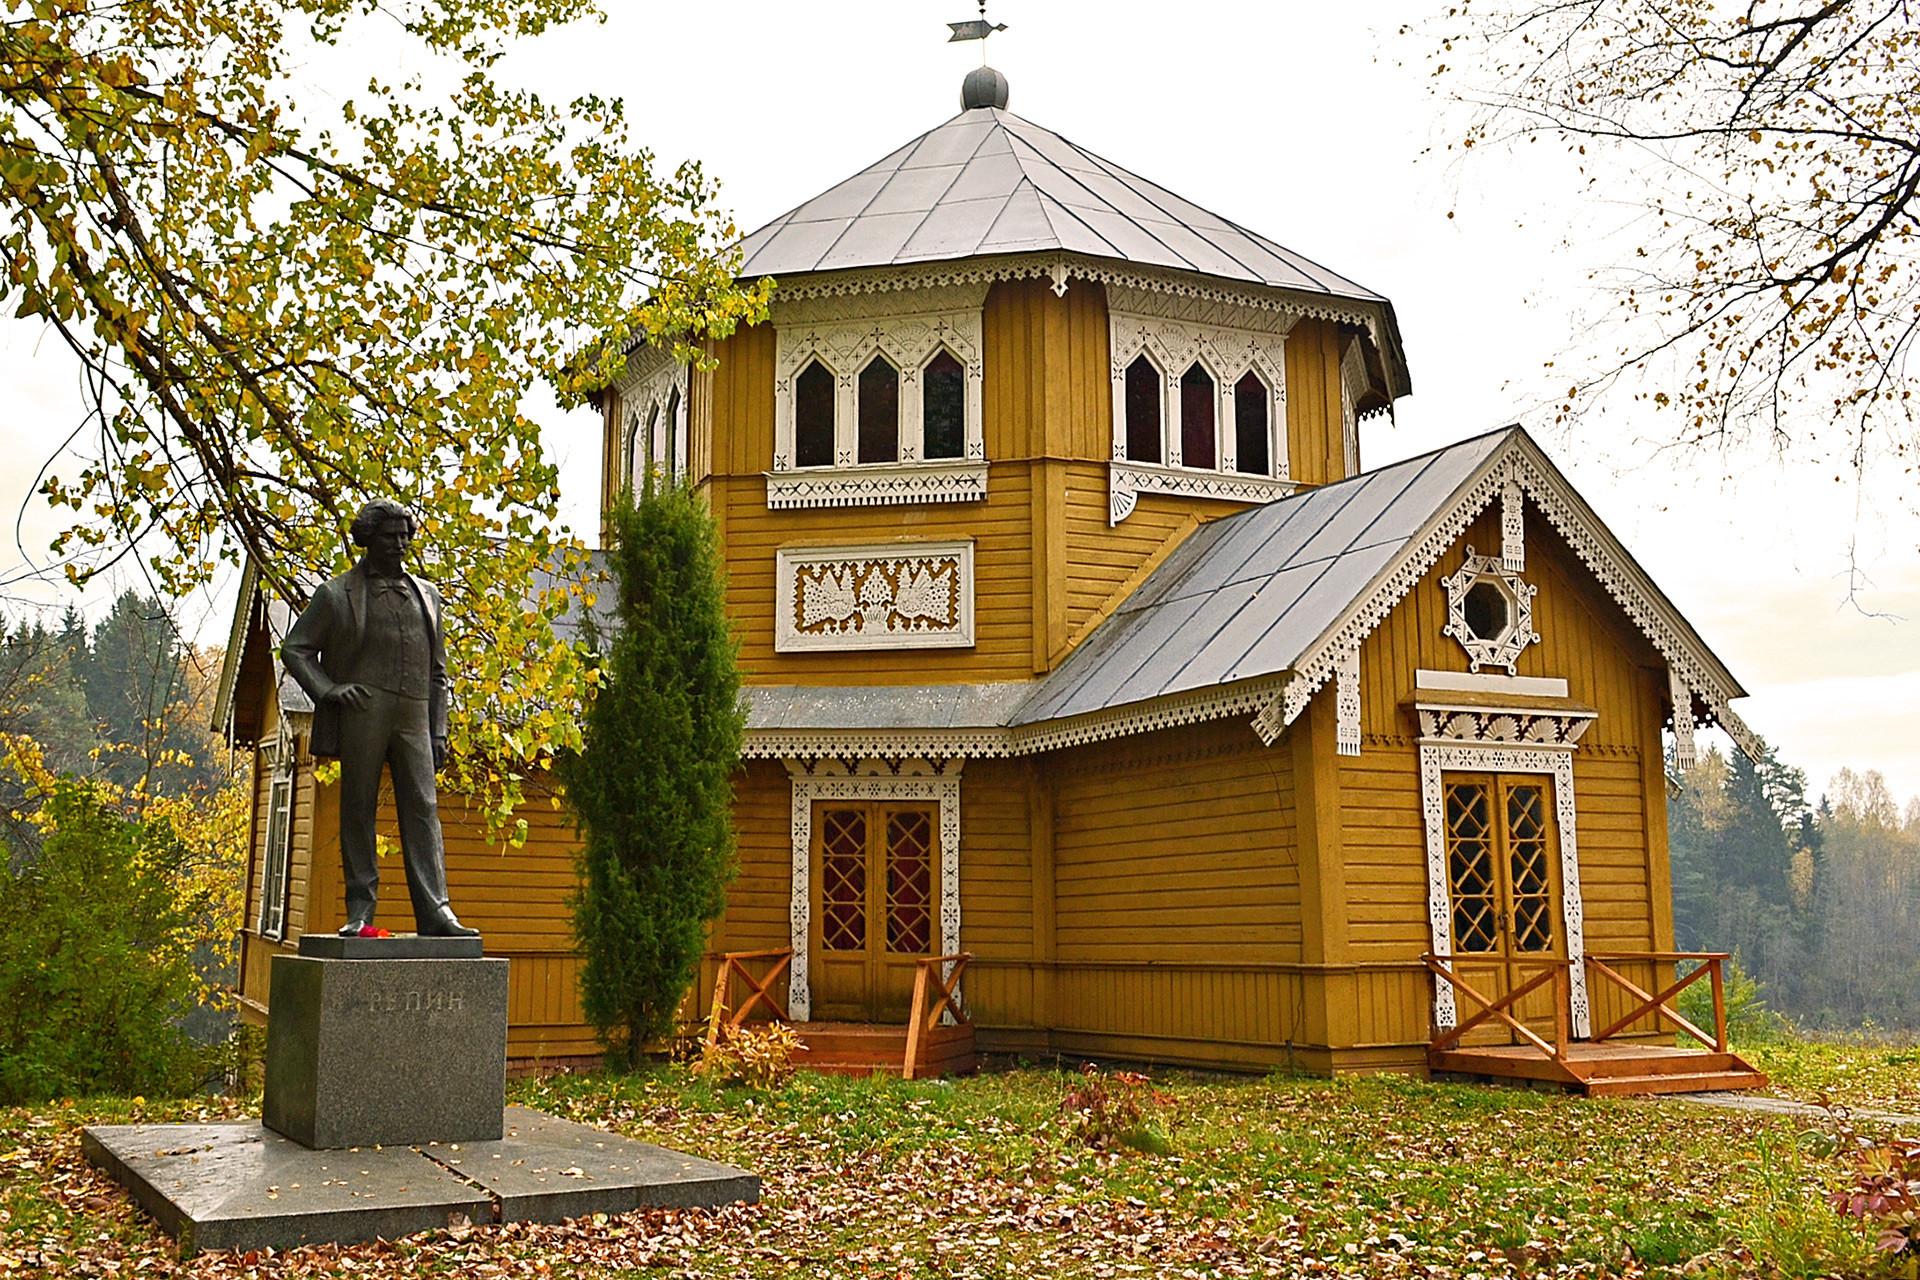 Repin-Denkmal am Parkhäuschen der Künstler-Datscha bei Wyschnij Wolotschok